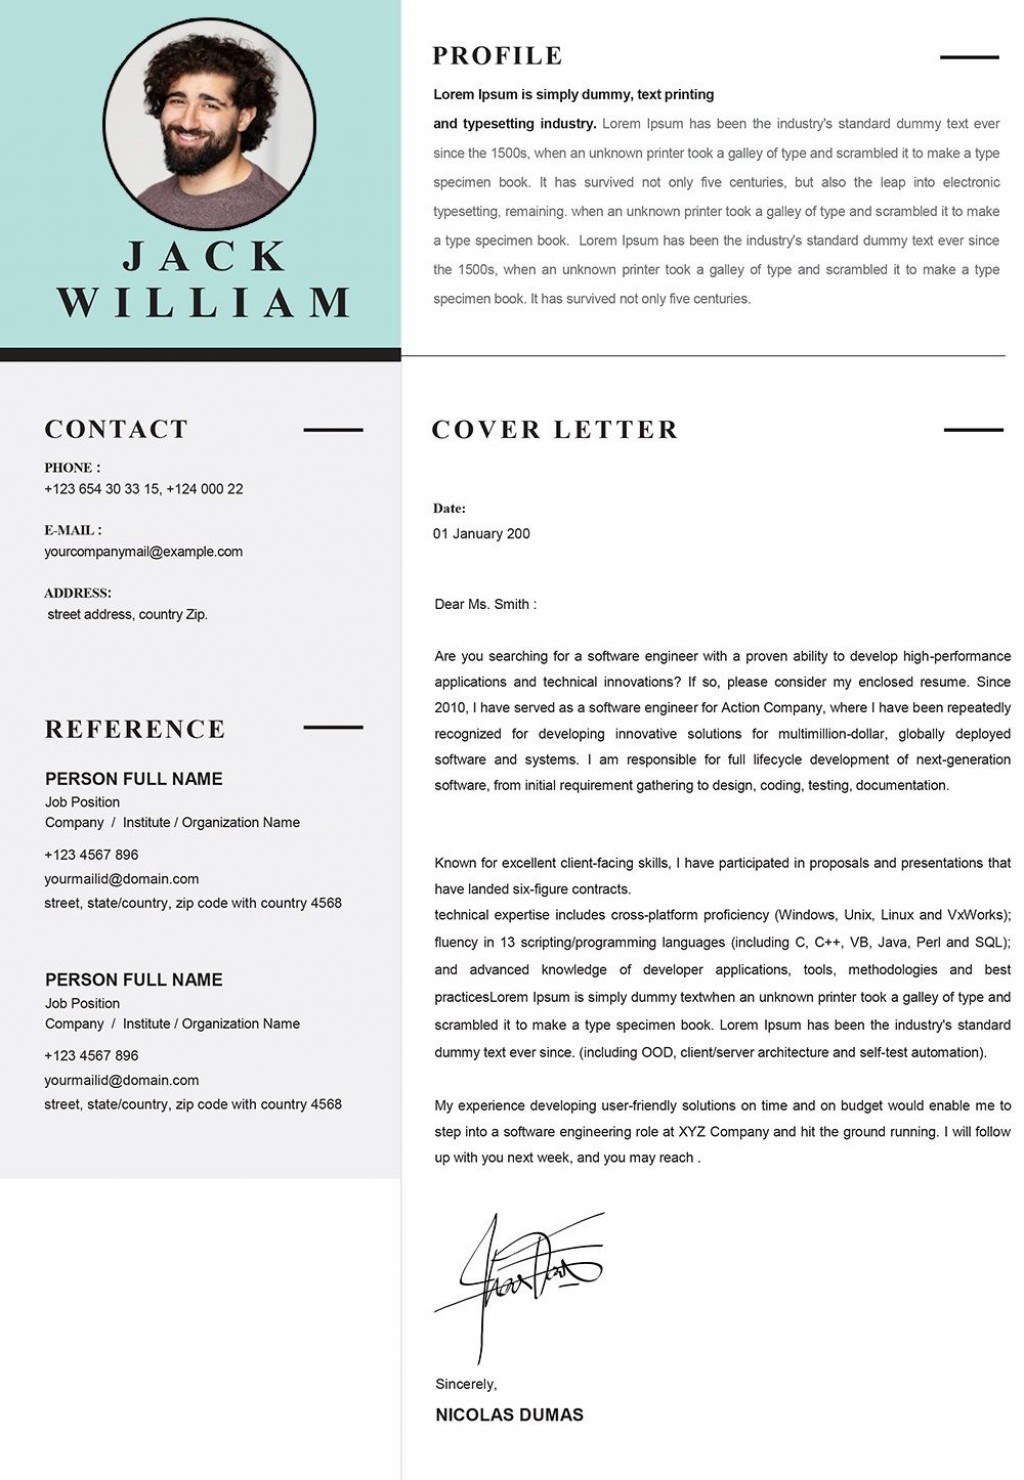 005 Marvelou Microsoft Cover Letter Template 2020 Idea Large